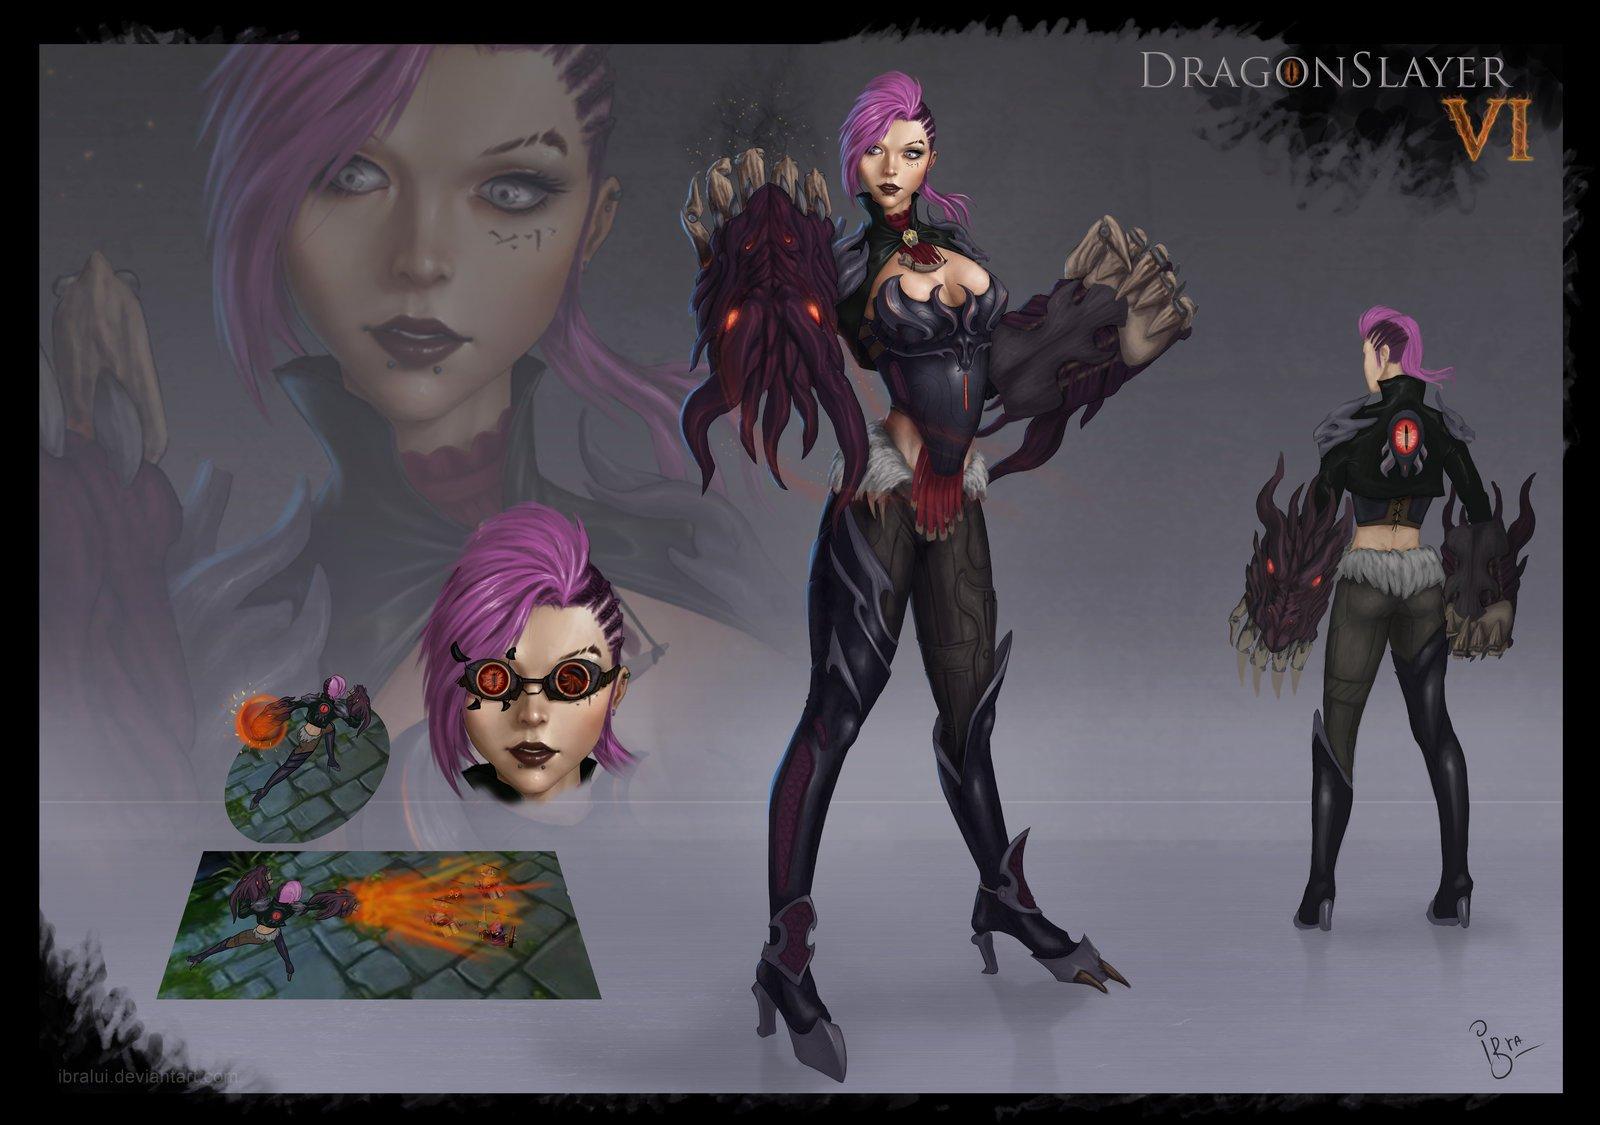 Dragonslayer Vi Concept Art